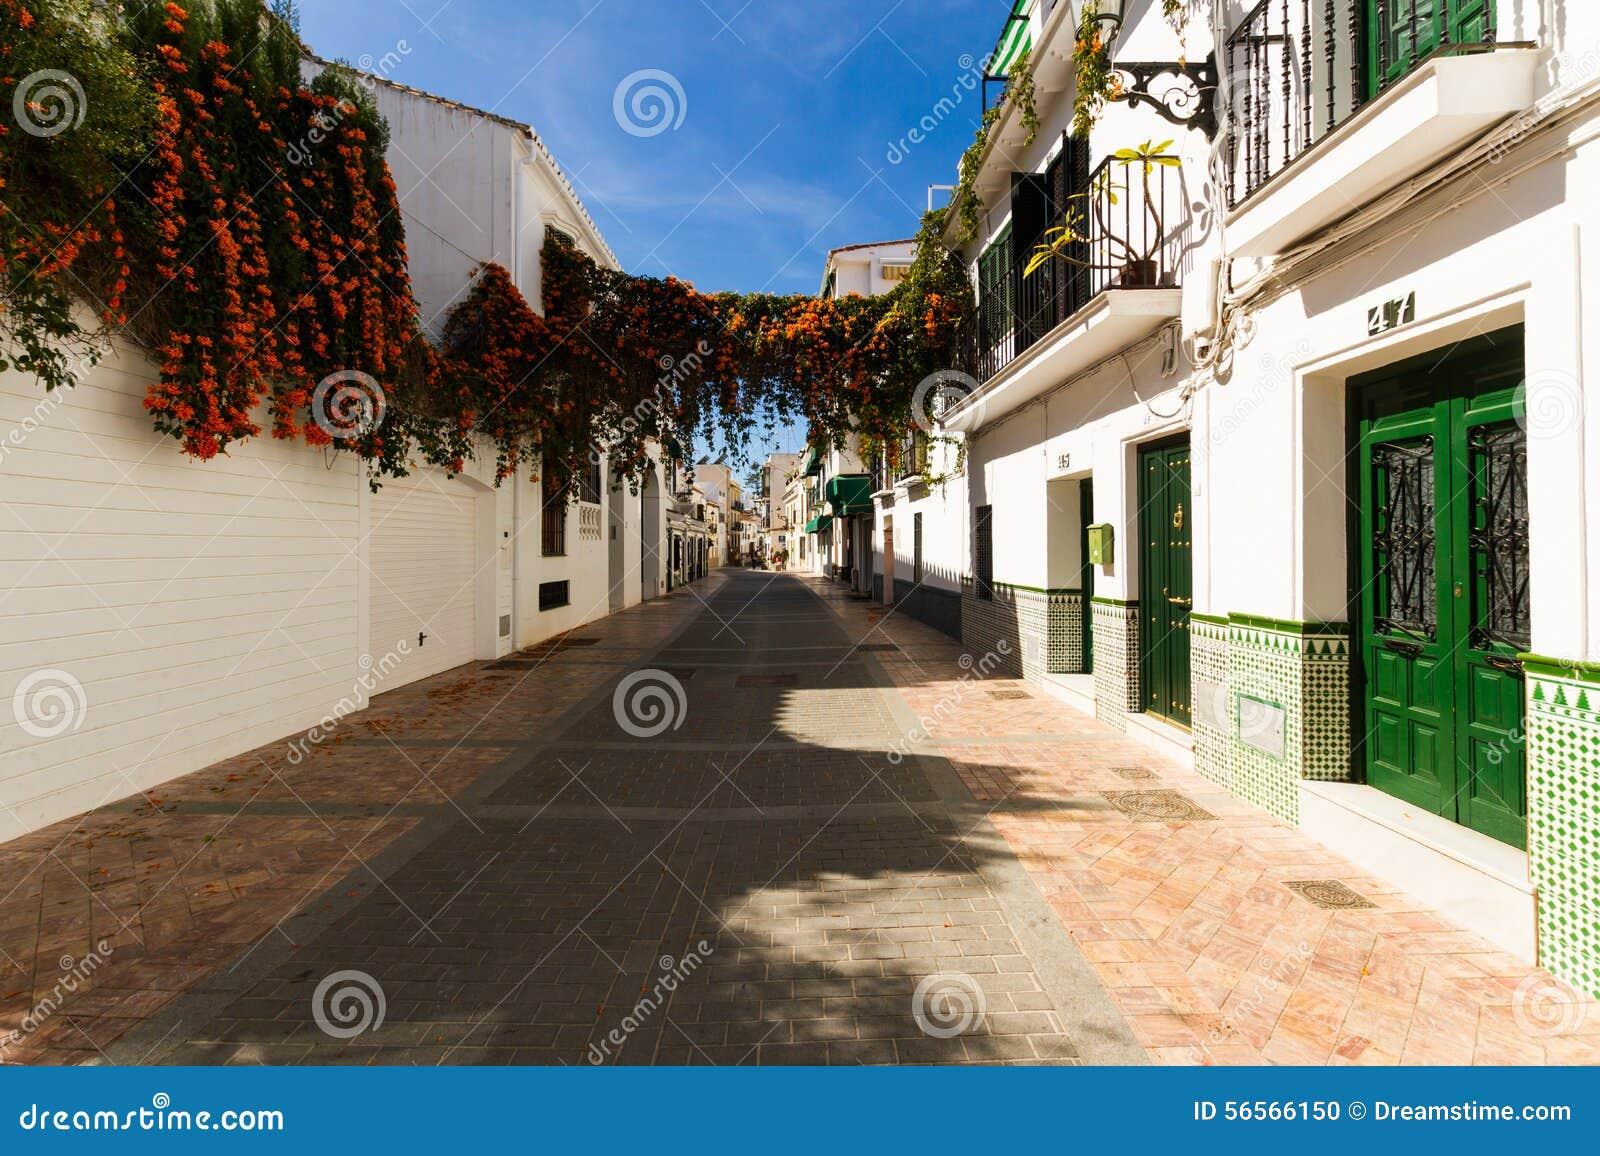 Download Ταξίδι της Ισπανίας στοκ εικόνες. εικόνα από ευρώπη, αυτοκίνητο - 56566150